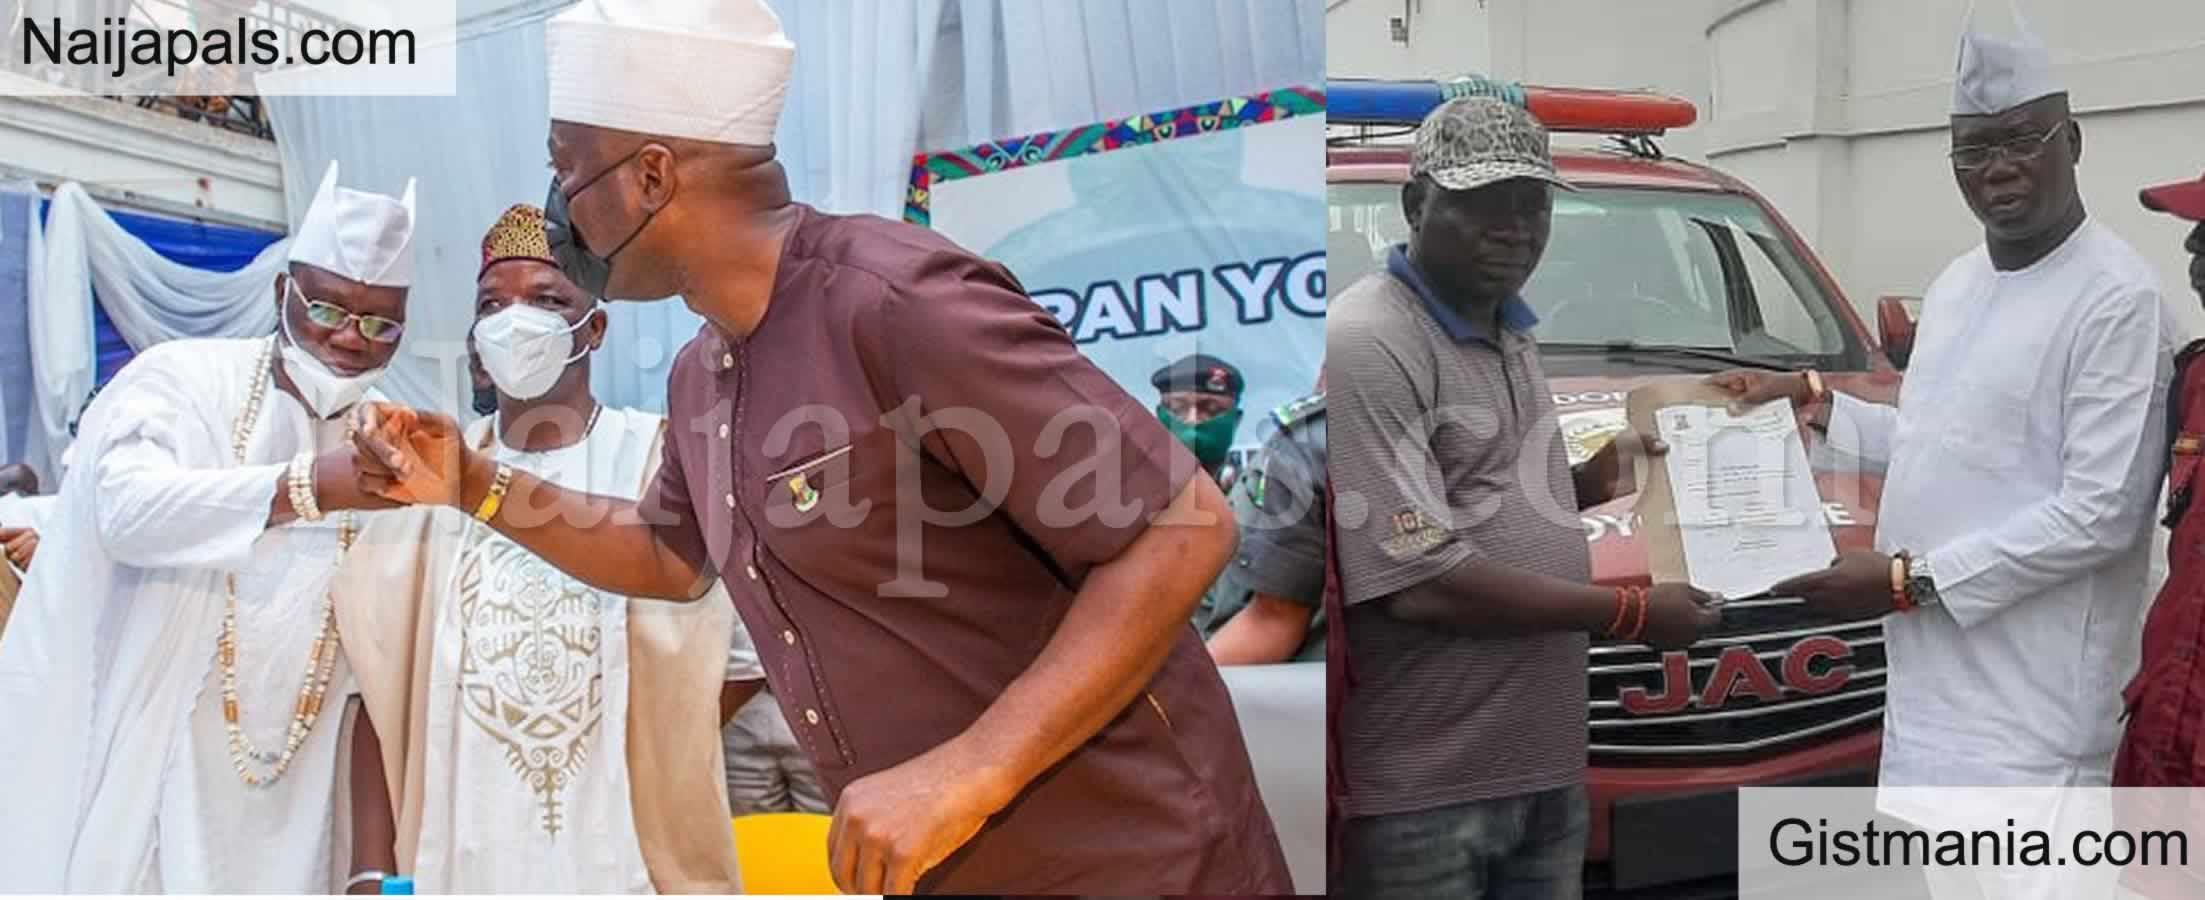 <img alt='.' class='lazyload' data-src='https://img.gistmania.com/emot/news.gif' /> <b>Gov. Makinde Appoints OPC Leader Gani Adams As Amotekun Ambassador in Oyo State</b>